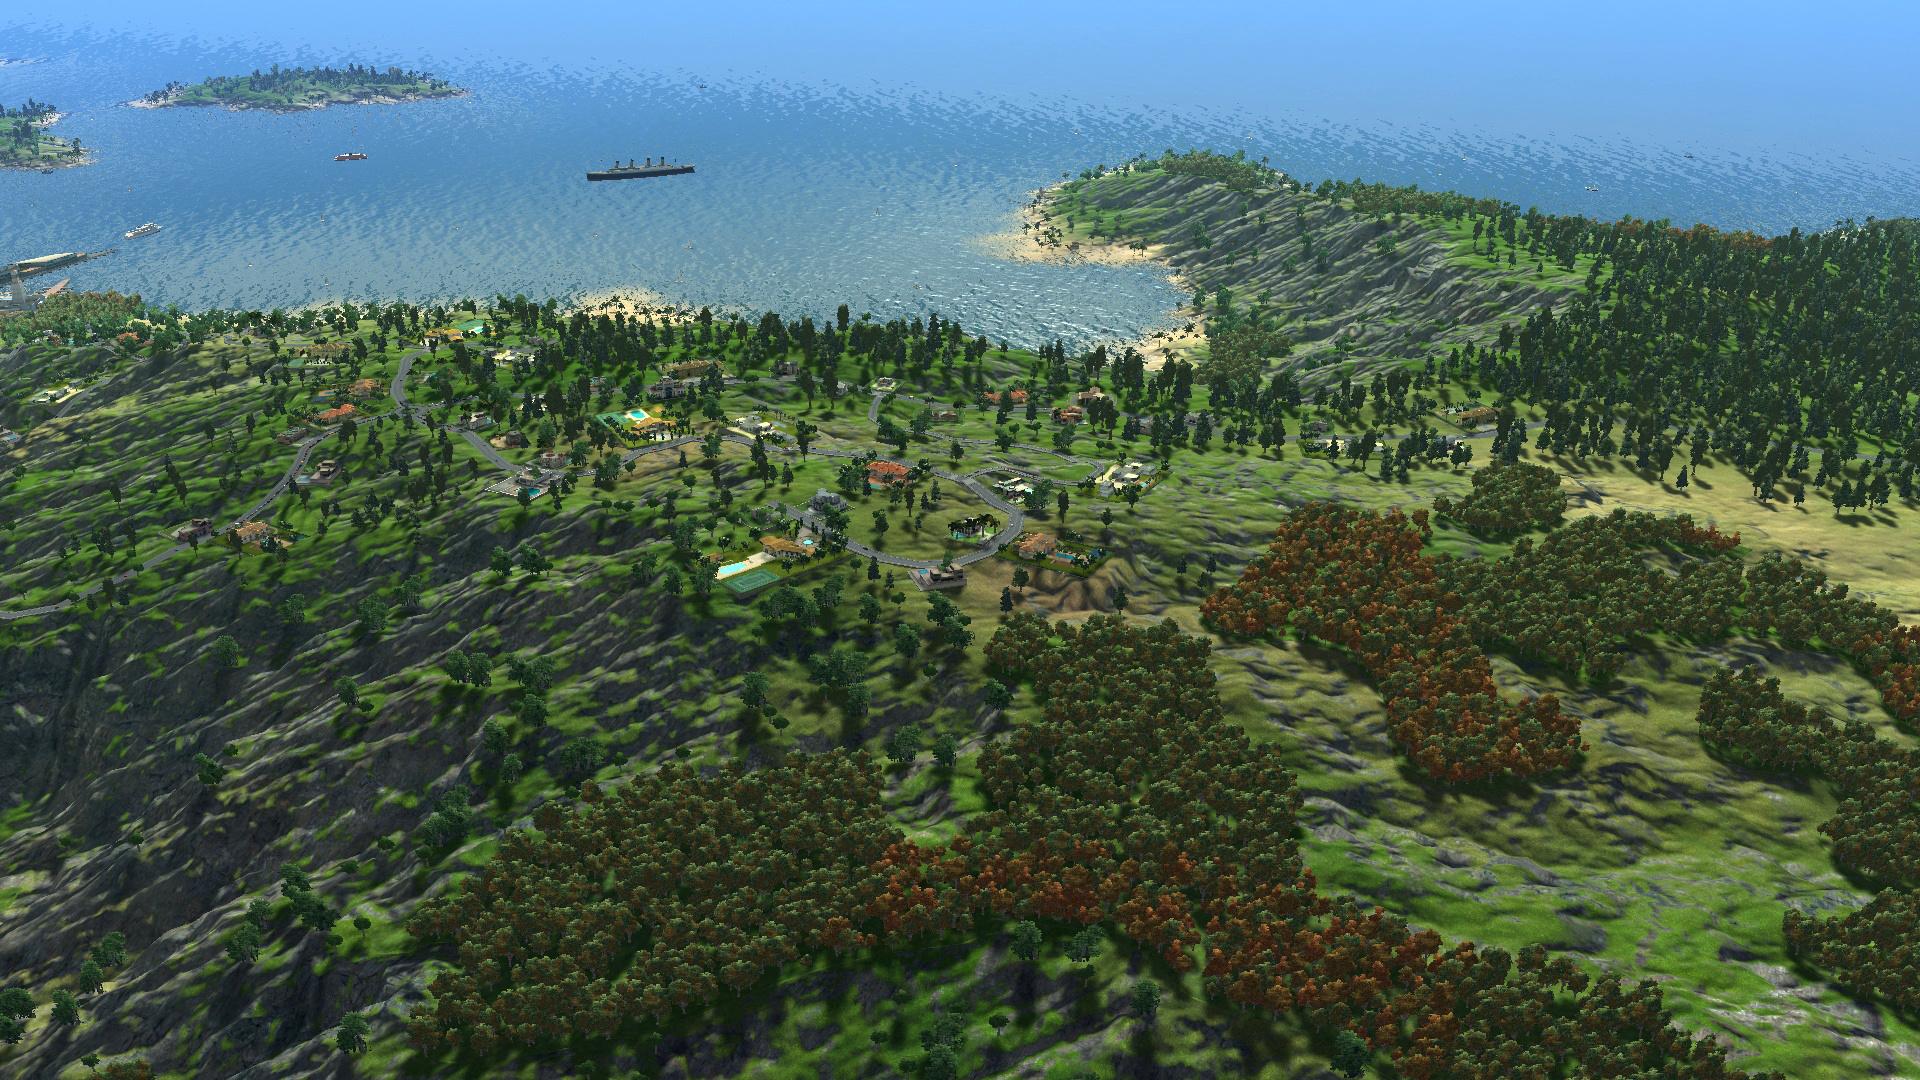 cxl_screenshot_cuva cavelio_Rural_8.jpg